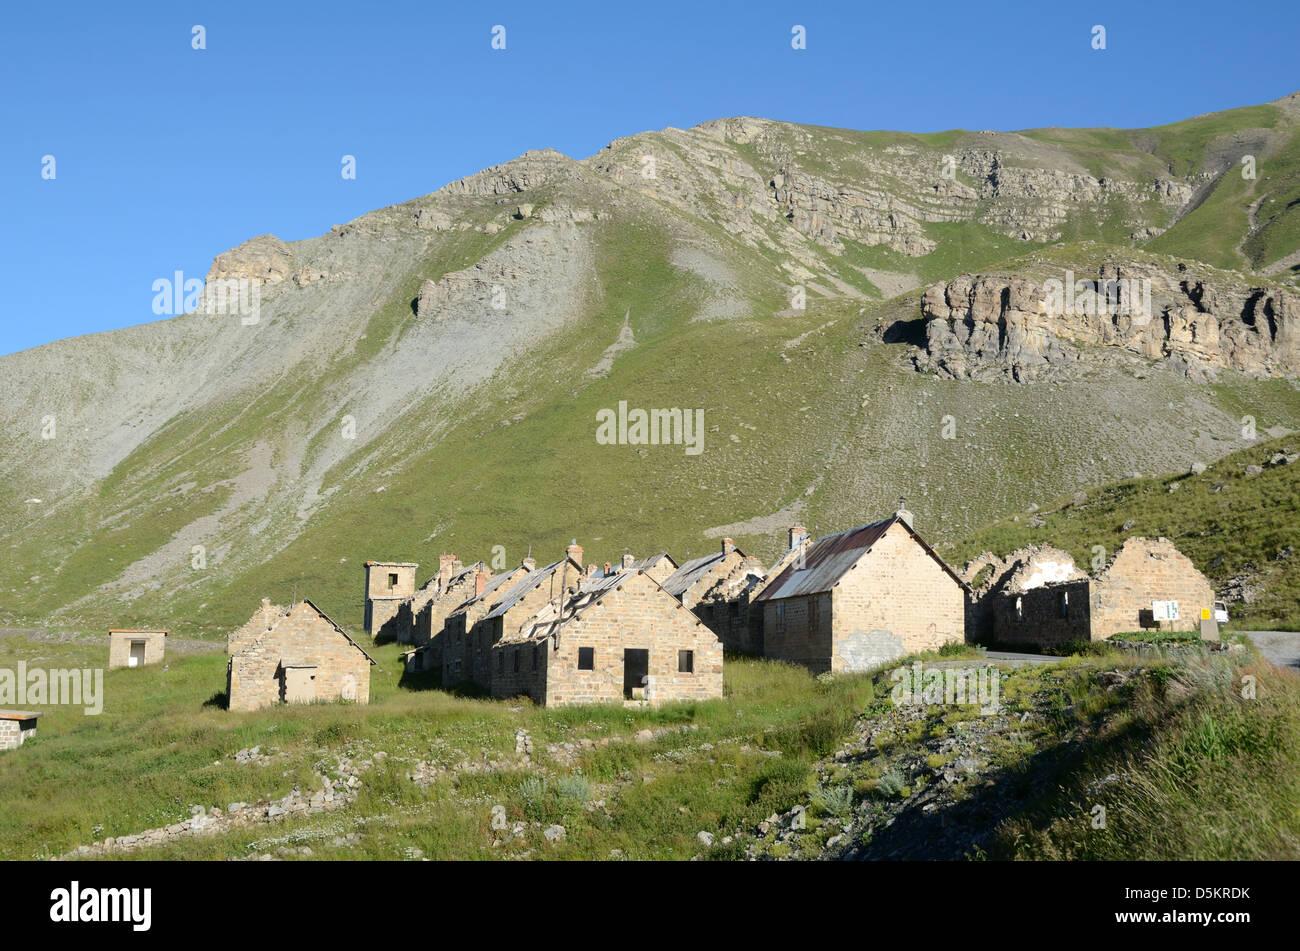 Ruined Military Camp des Fourches Route de la Bonette French Alps France - Stock Image